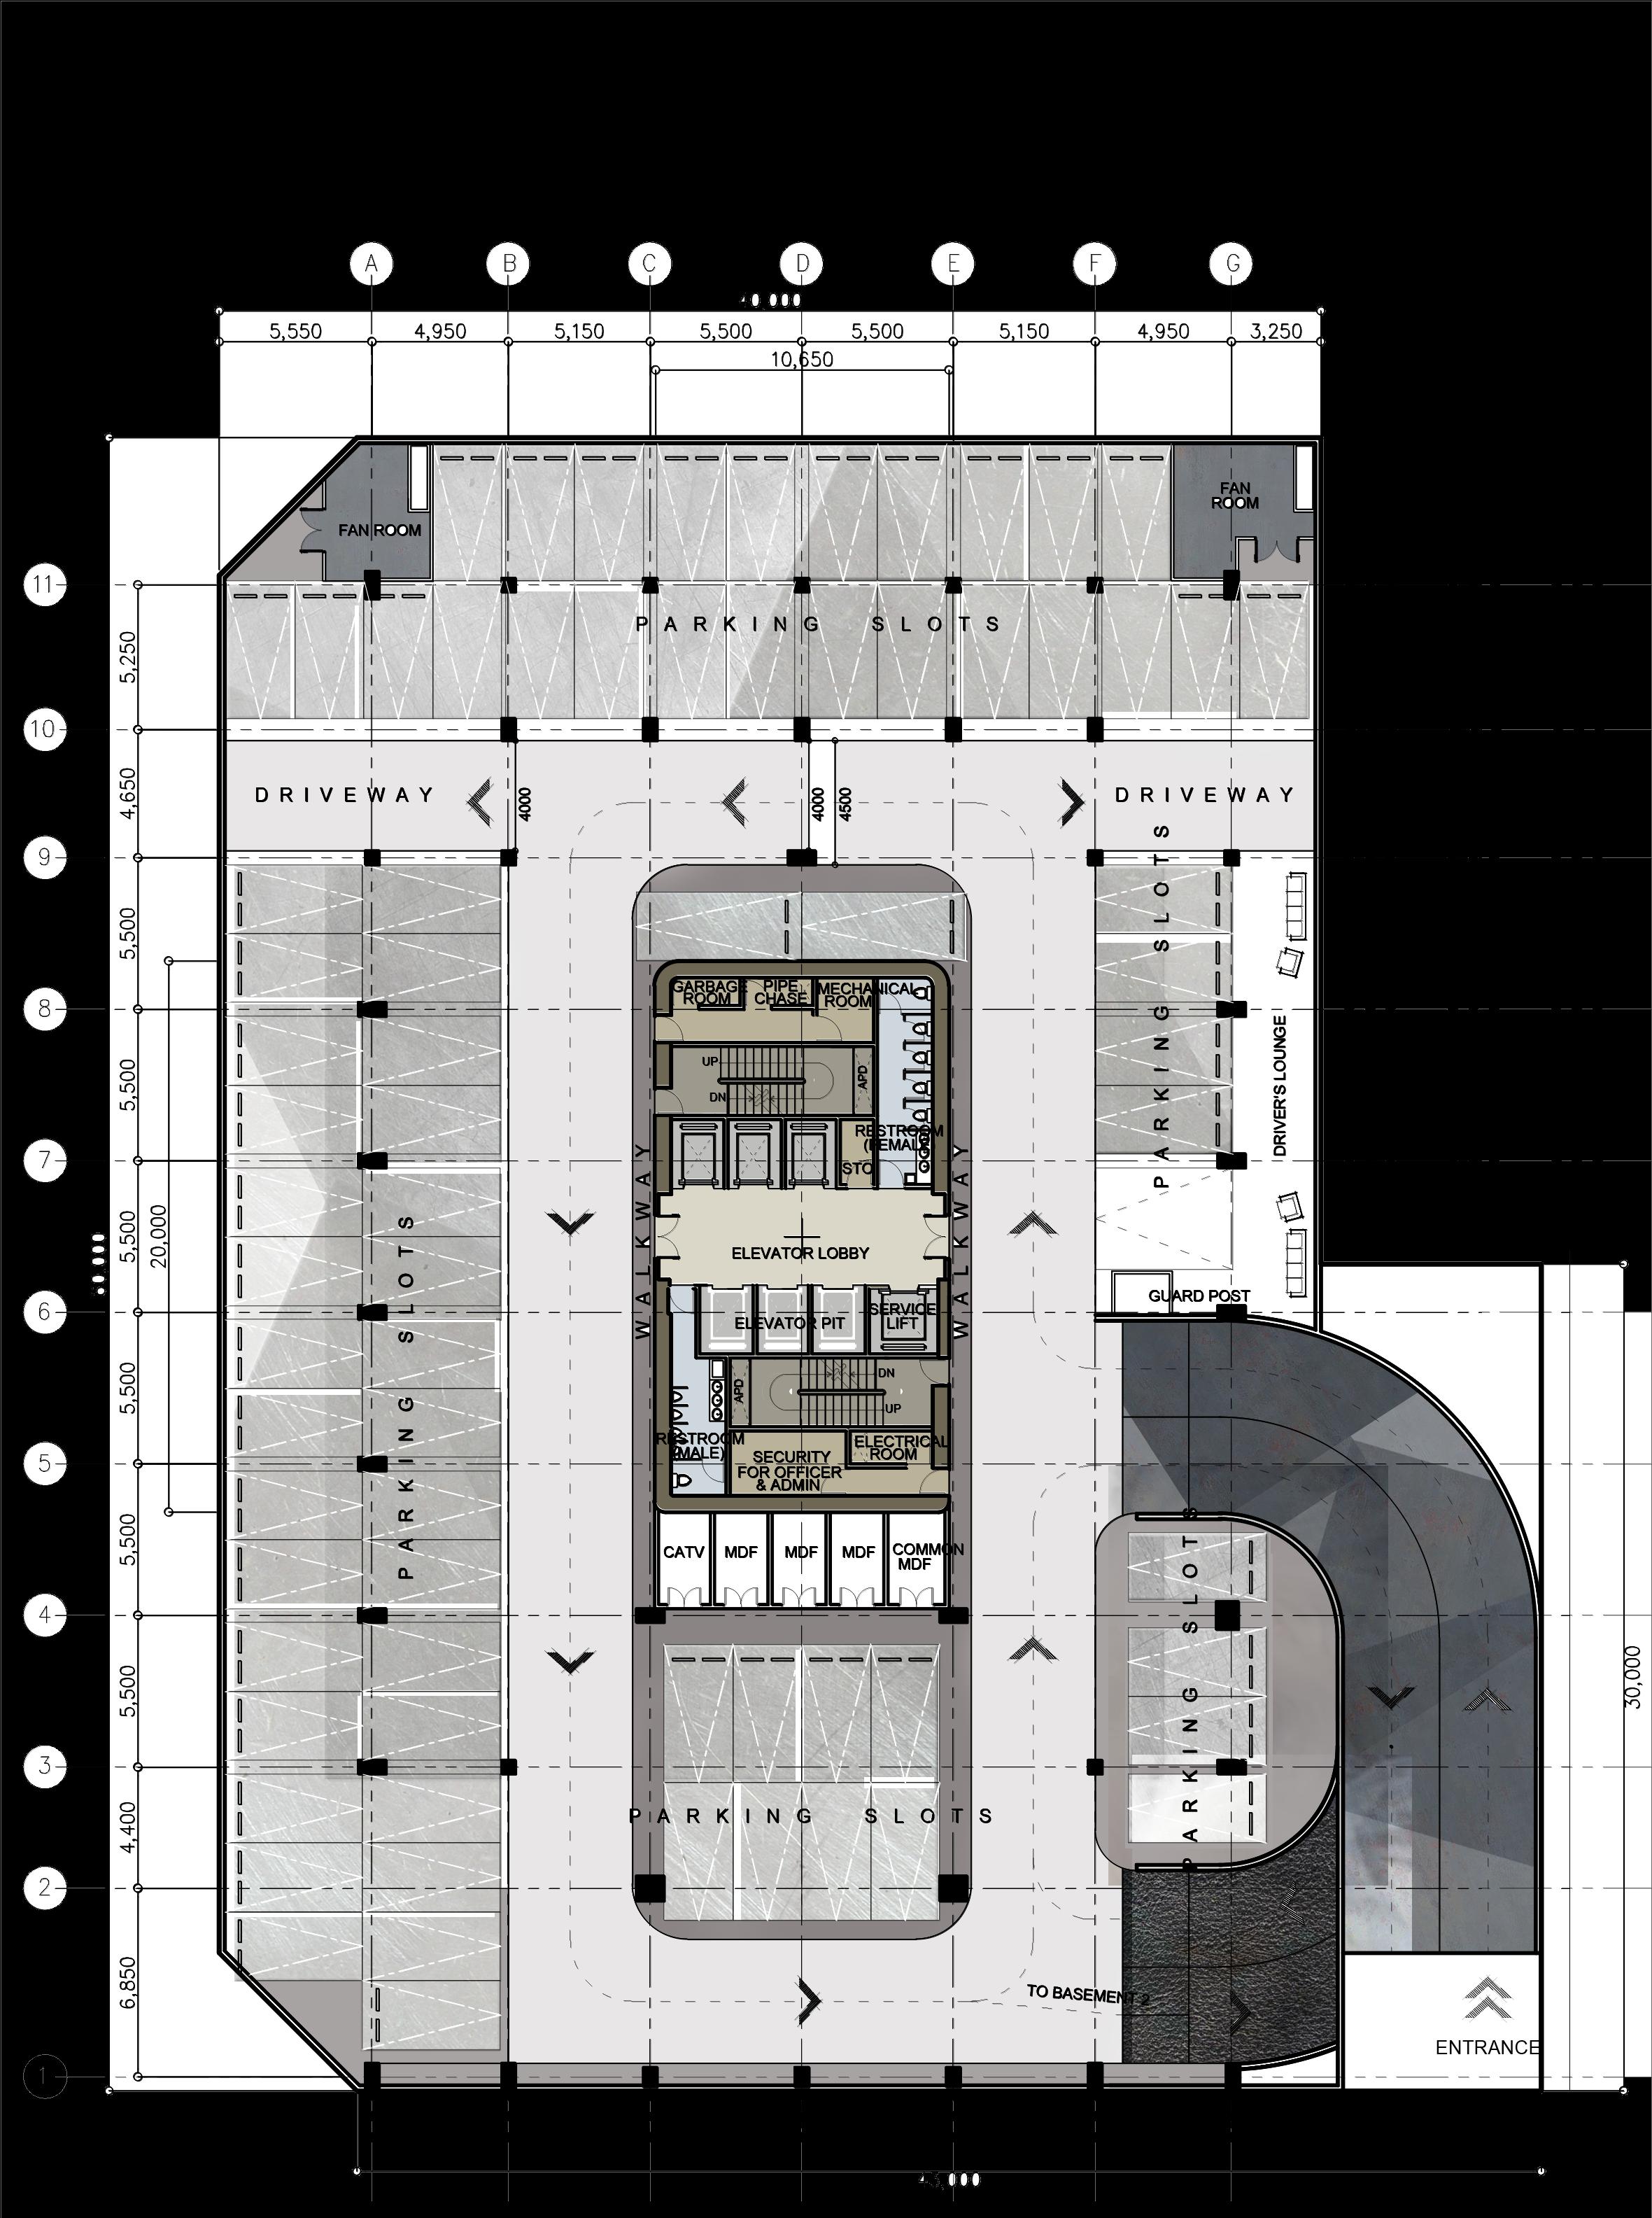 Commercial Building Floor Plans Png Multi Storey Car Parking Plan Clipart Large Size Png Image Pikpng